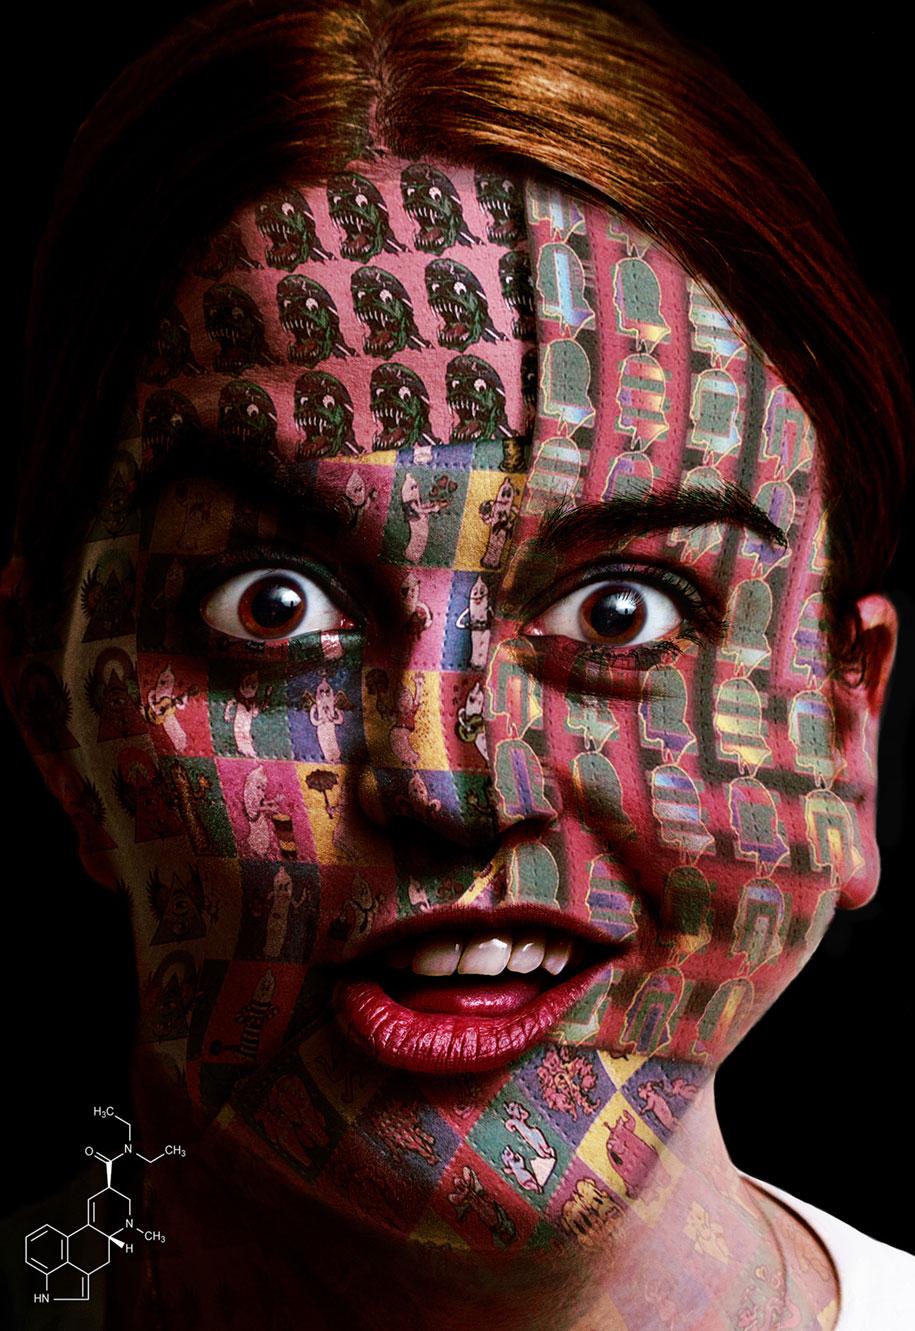 people-using-drugs-portraits-inebrination-les-baker-v-9